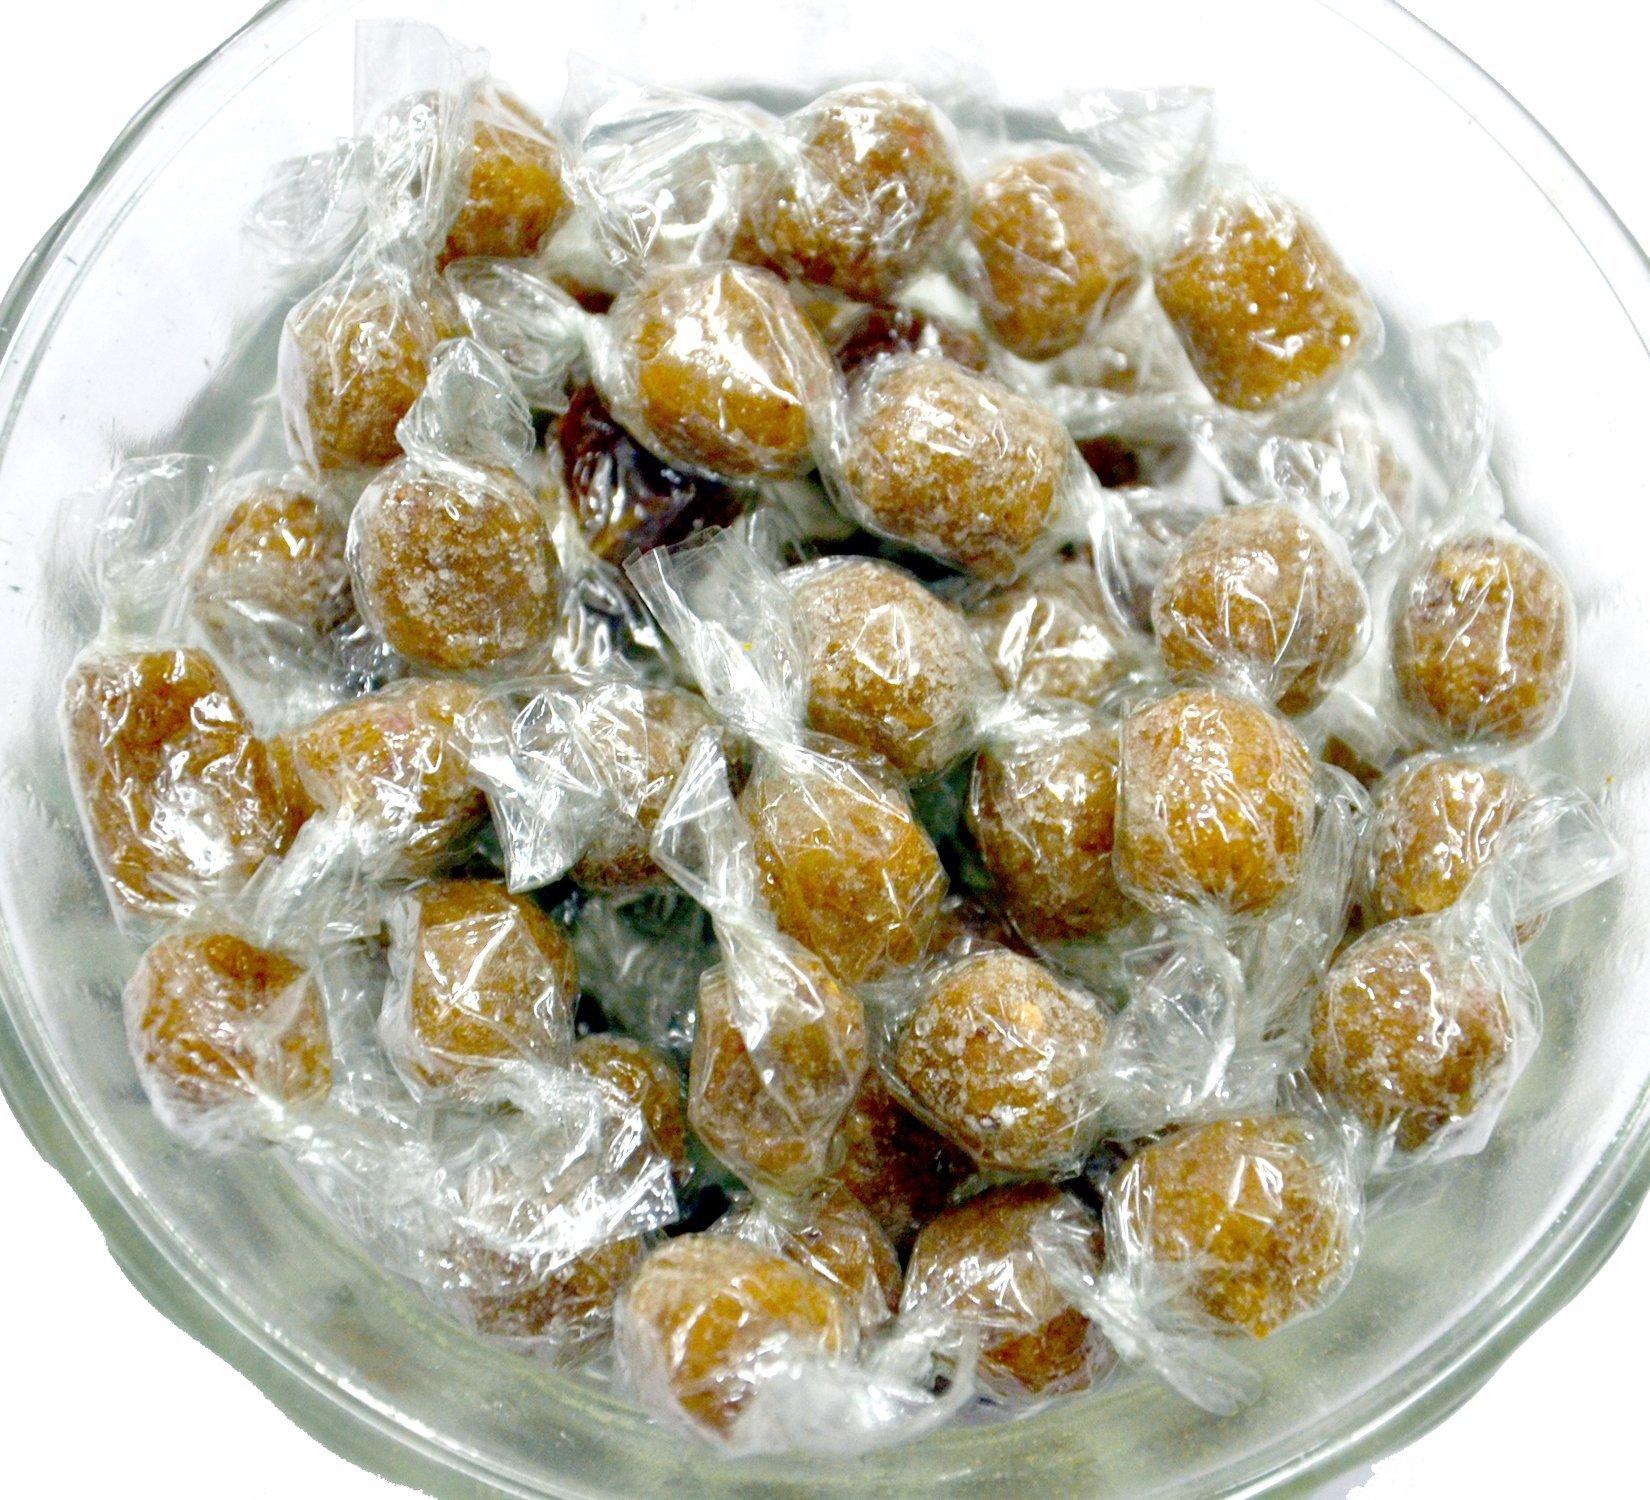 Leeve Dry Fruits Khatti-Methi Imli Tamarind - 800 Gms